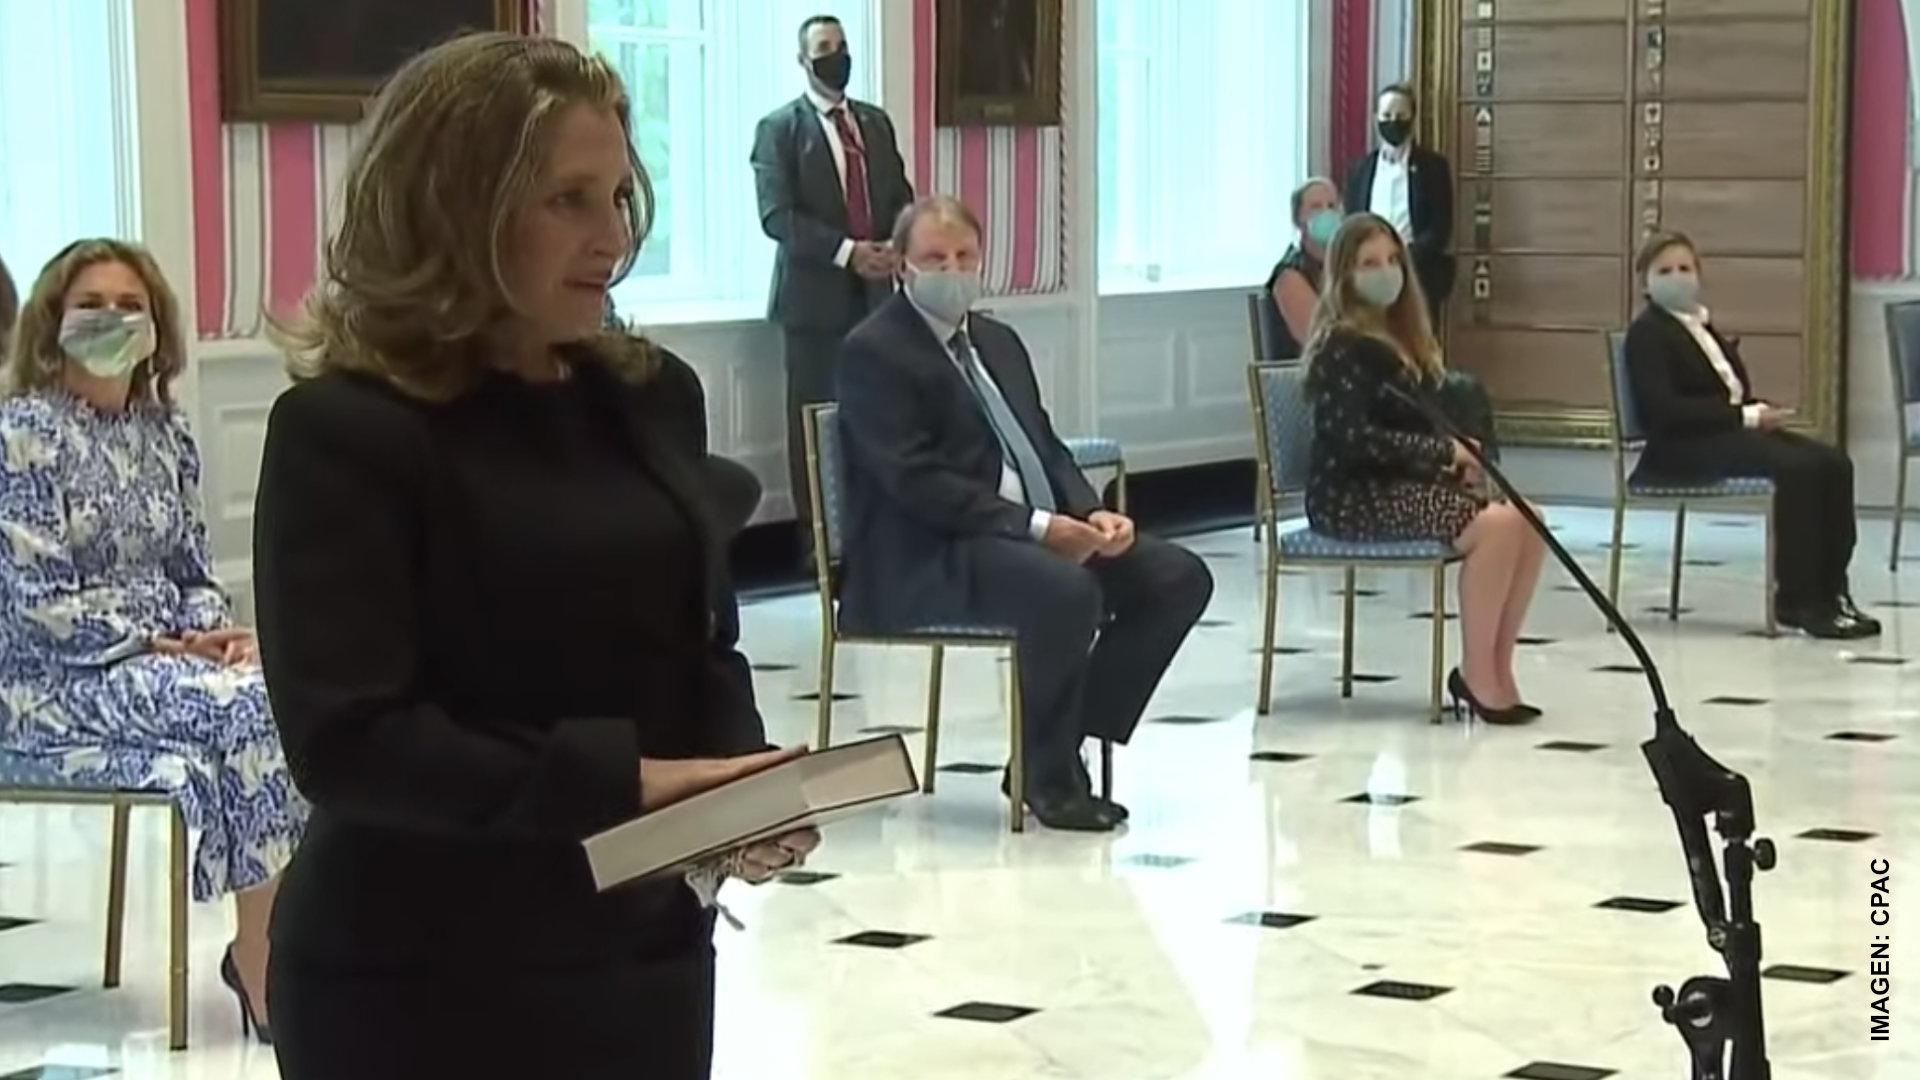 Chrystia Freeland, nueva ministra de Finanzas